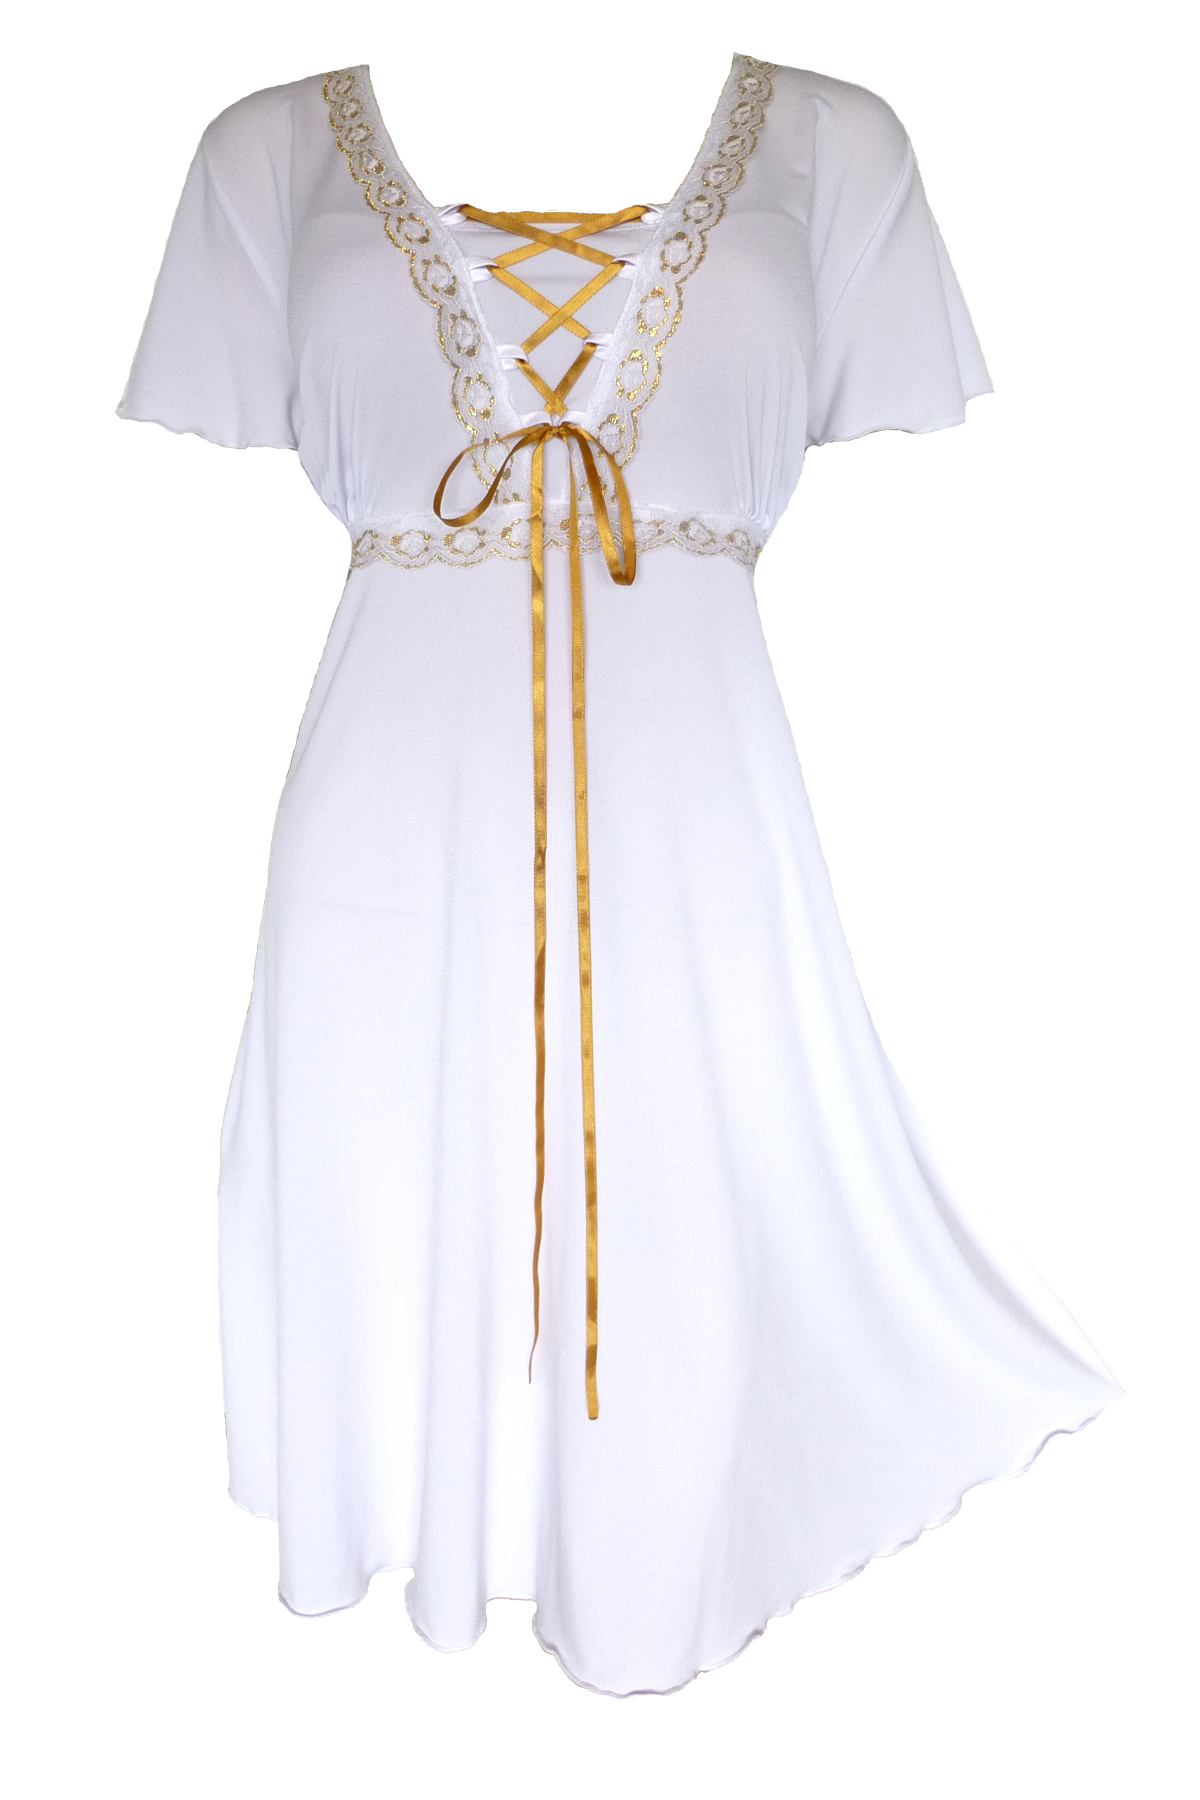 Dare To Wear Victorian Gothic Boho Women's Plus Size Angel Corset Dress S - 5x